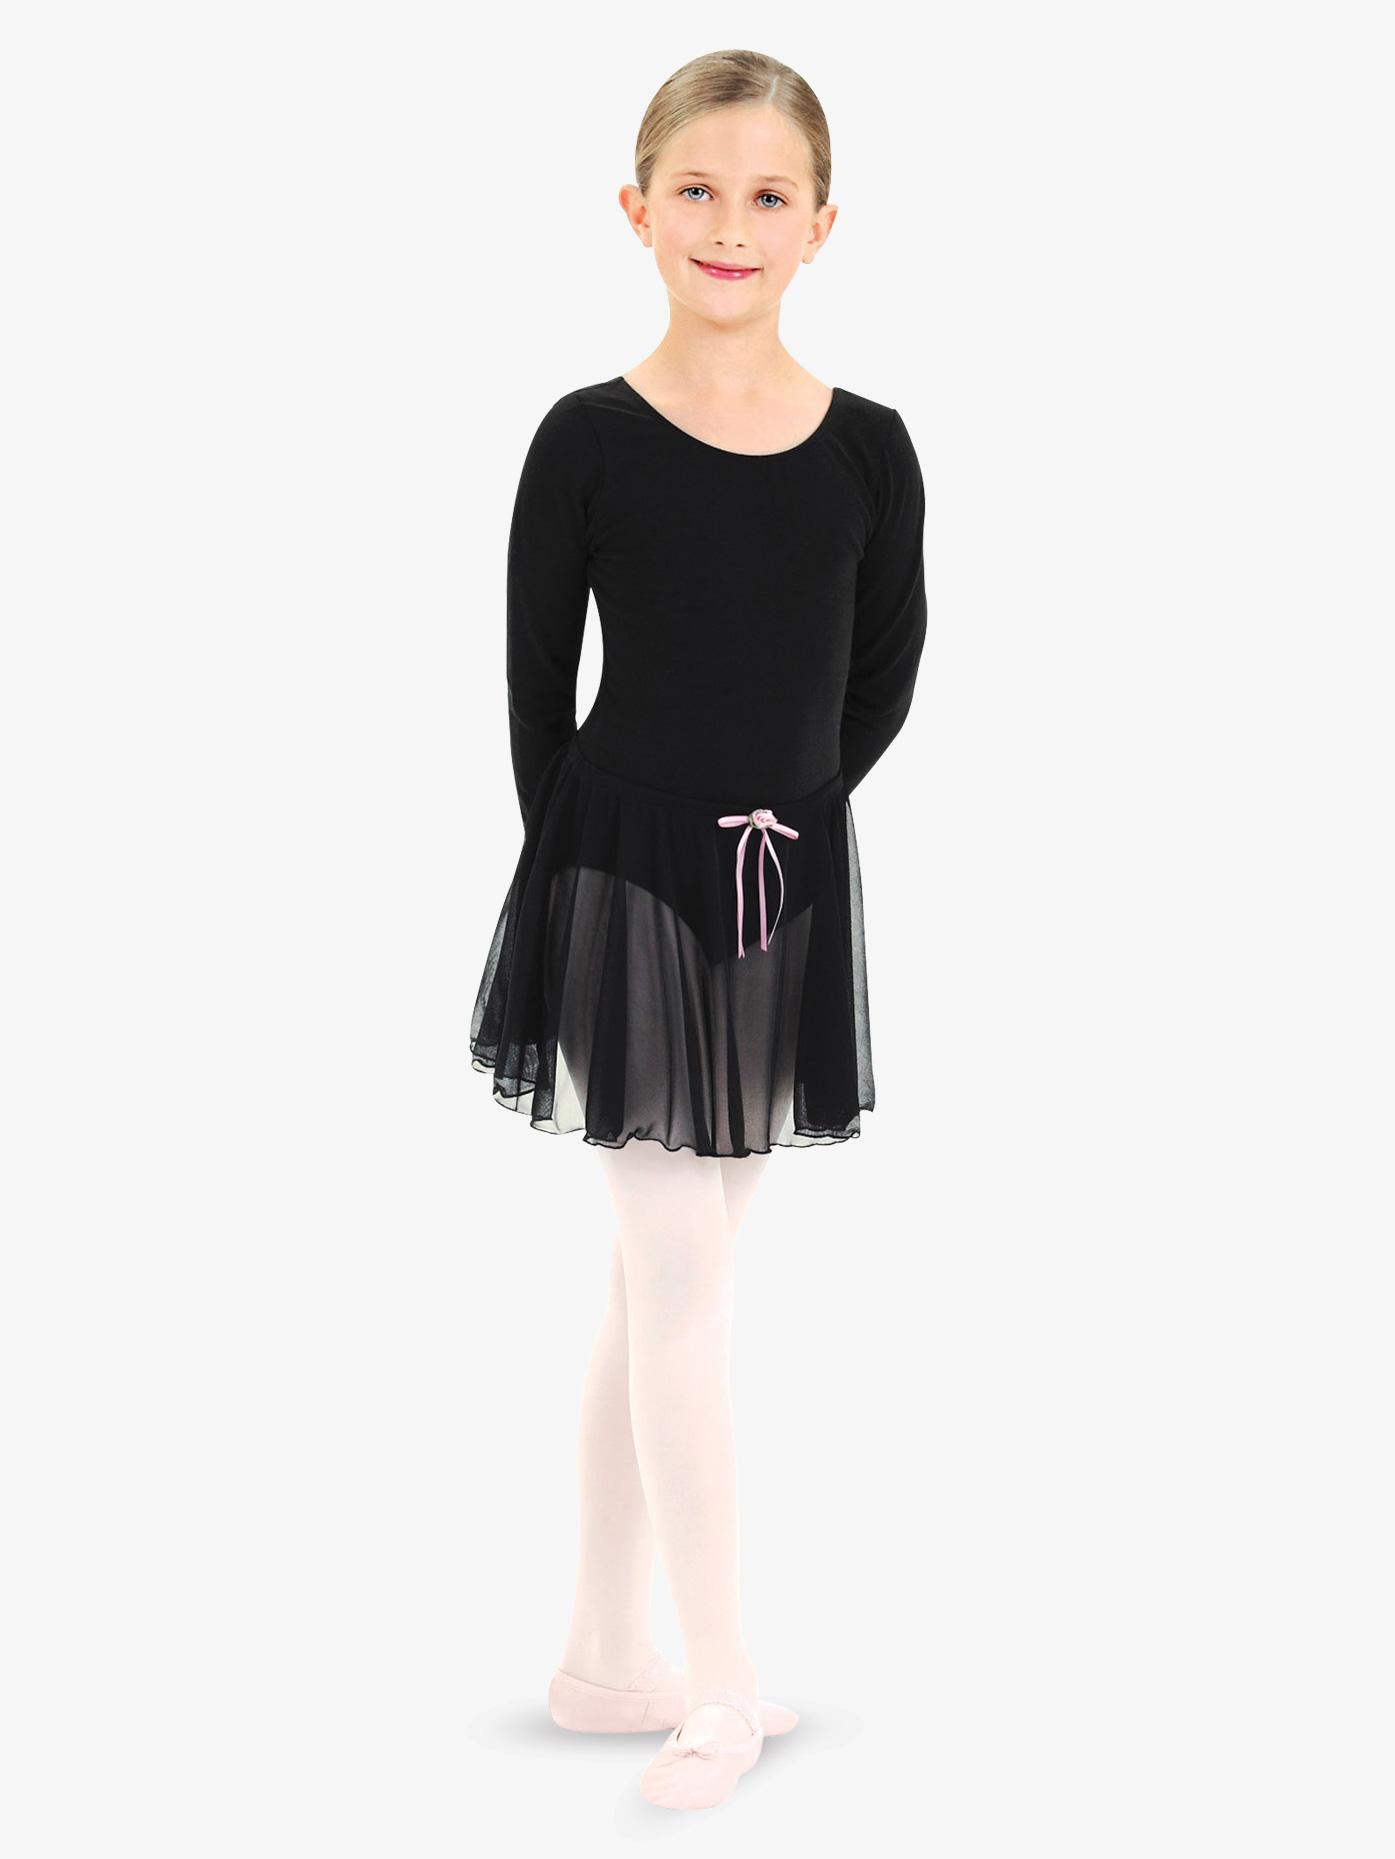 Future Star Child Chiffon Skirt U7001CP